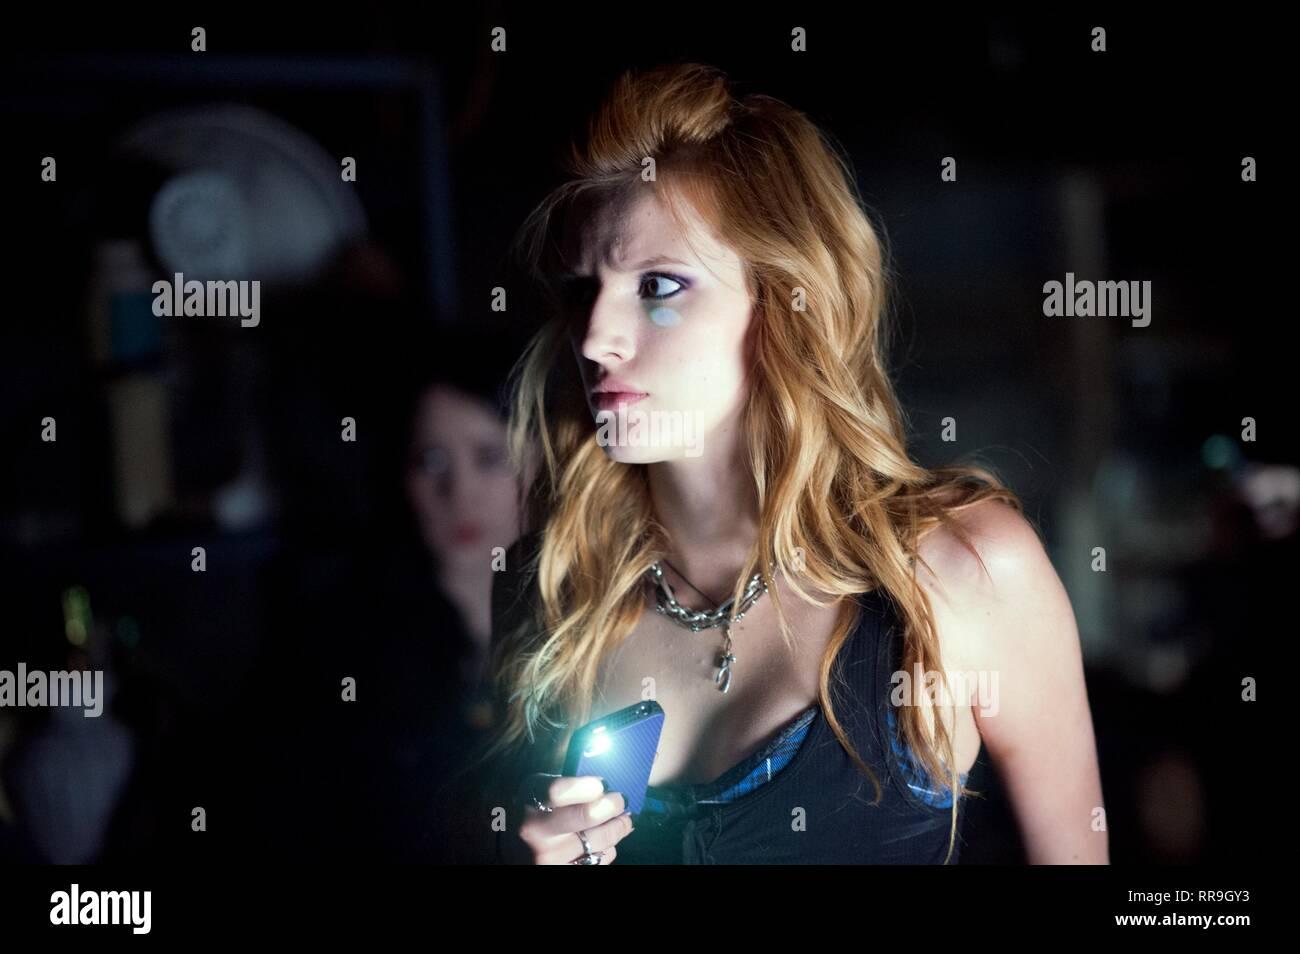 AMITYVILLE: THE AWAKENING, BELLA THORNE, 2017 - Stock Image